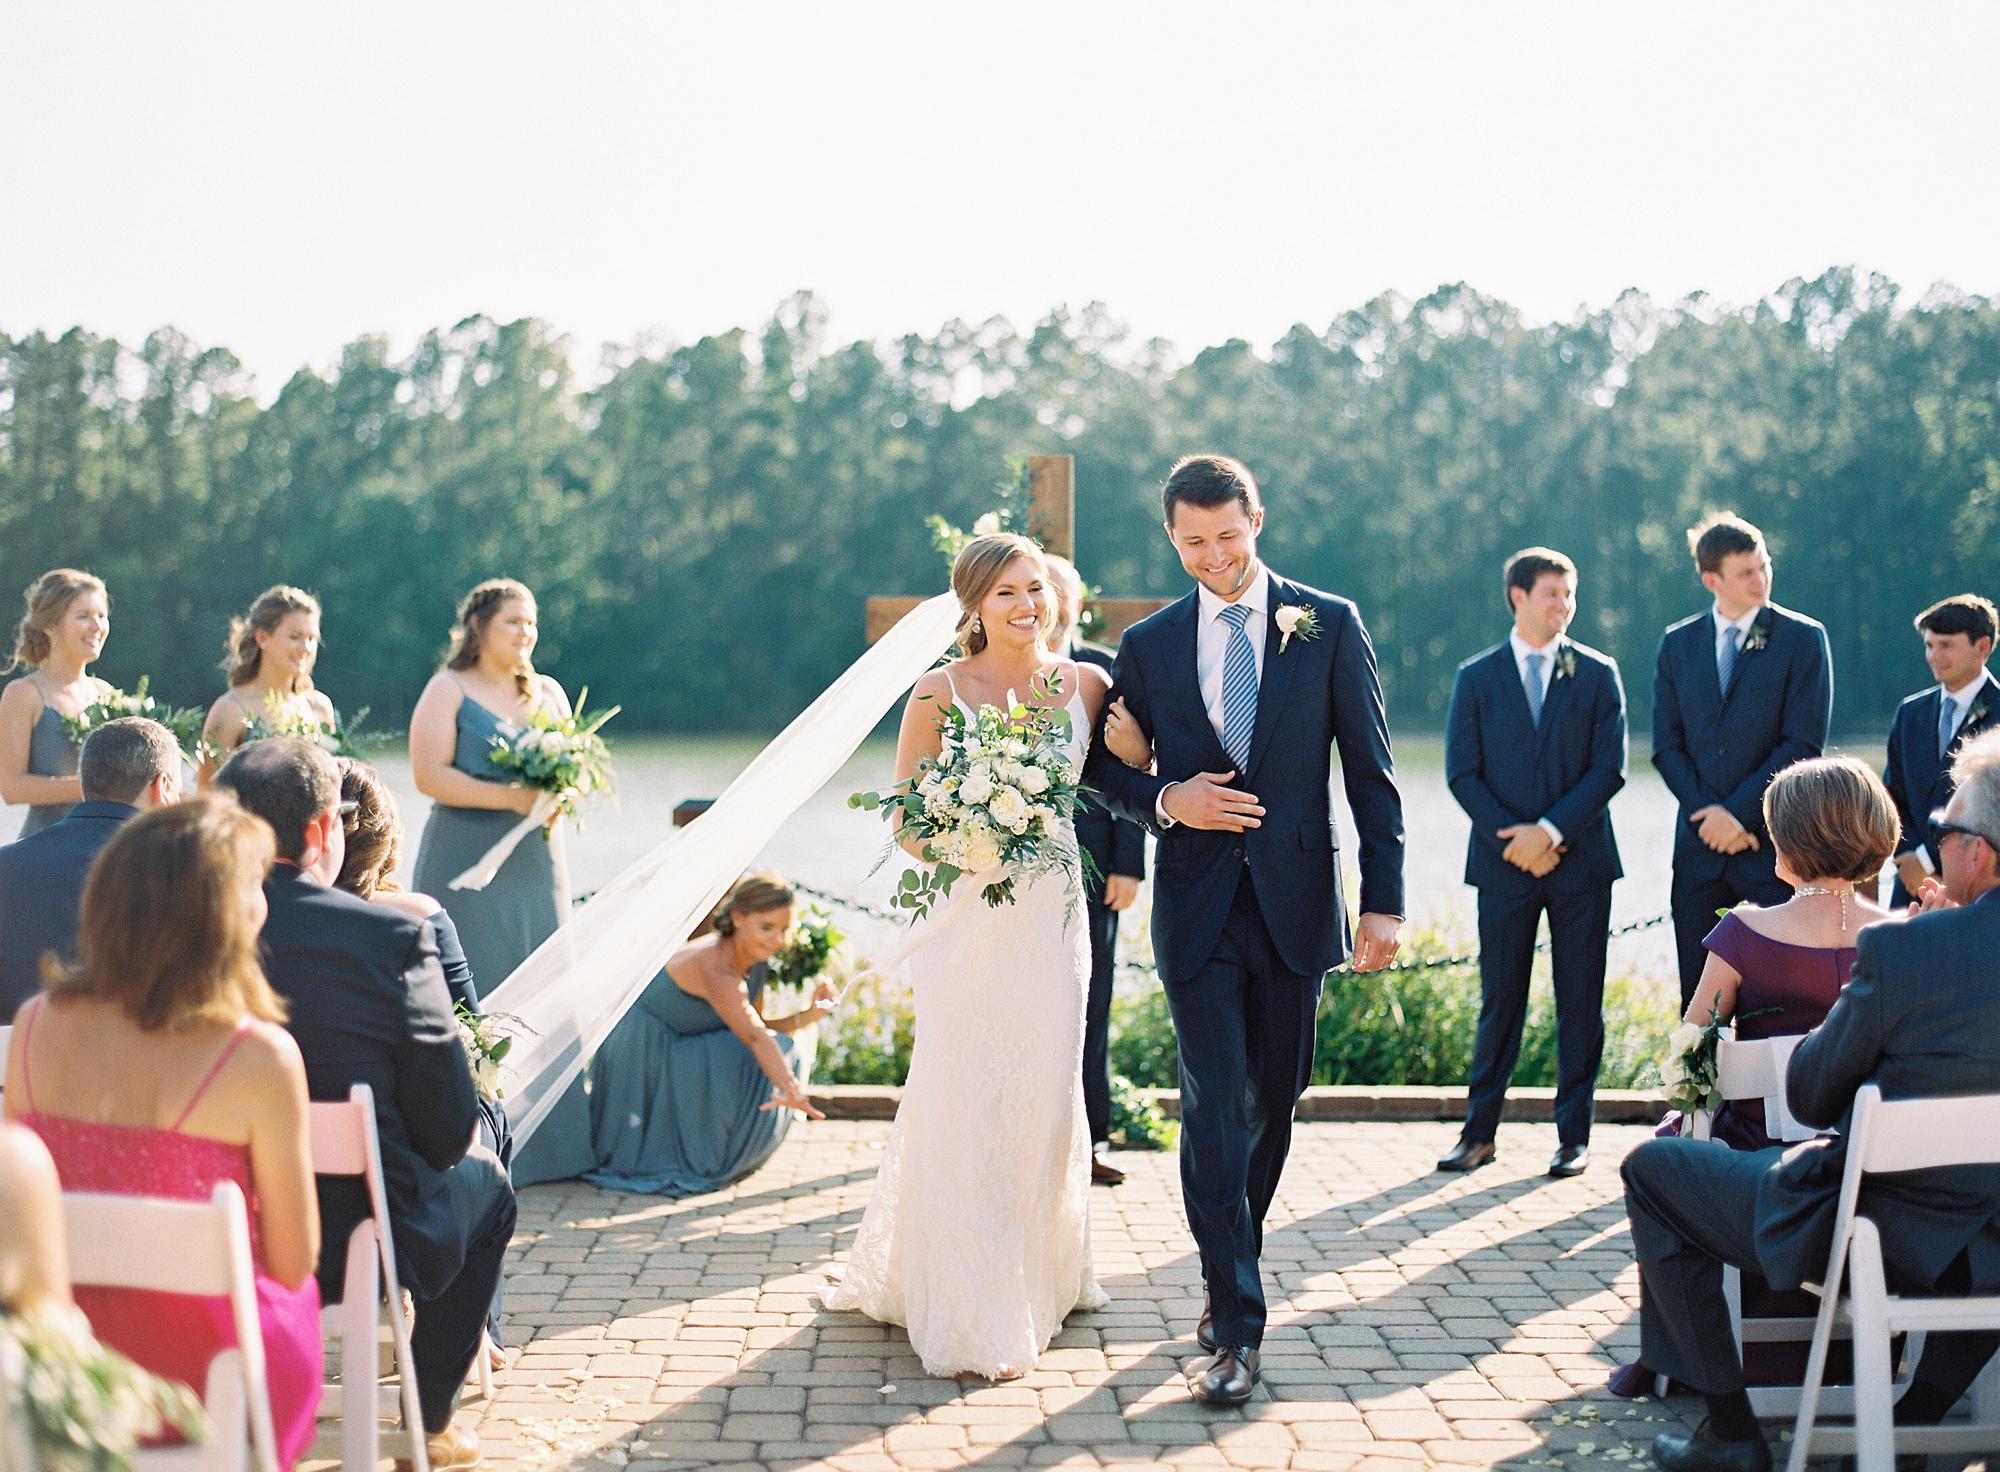 Angus-Barn-Pavilion-Raleigh-Wedding-Film-Photographer_0192.jpg